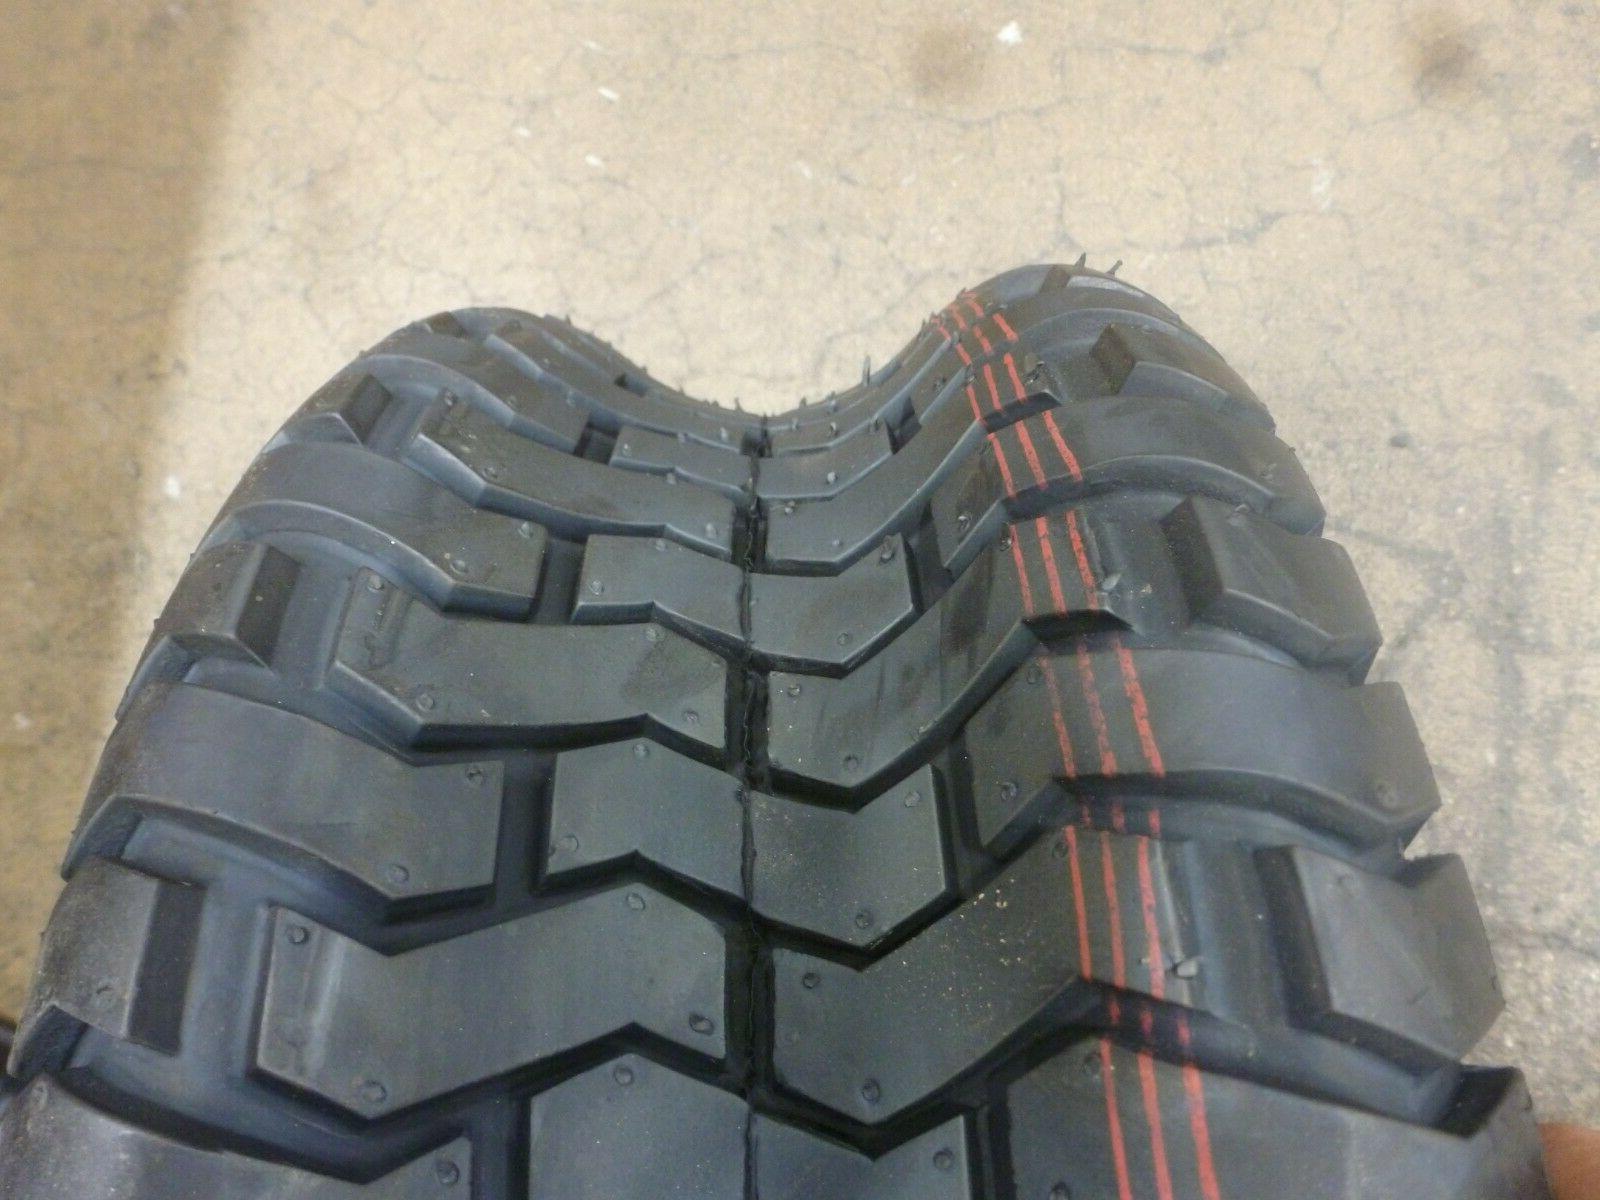 18x8 5x8 turf tire single lawn mower